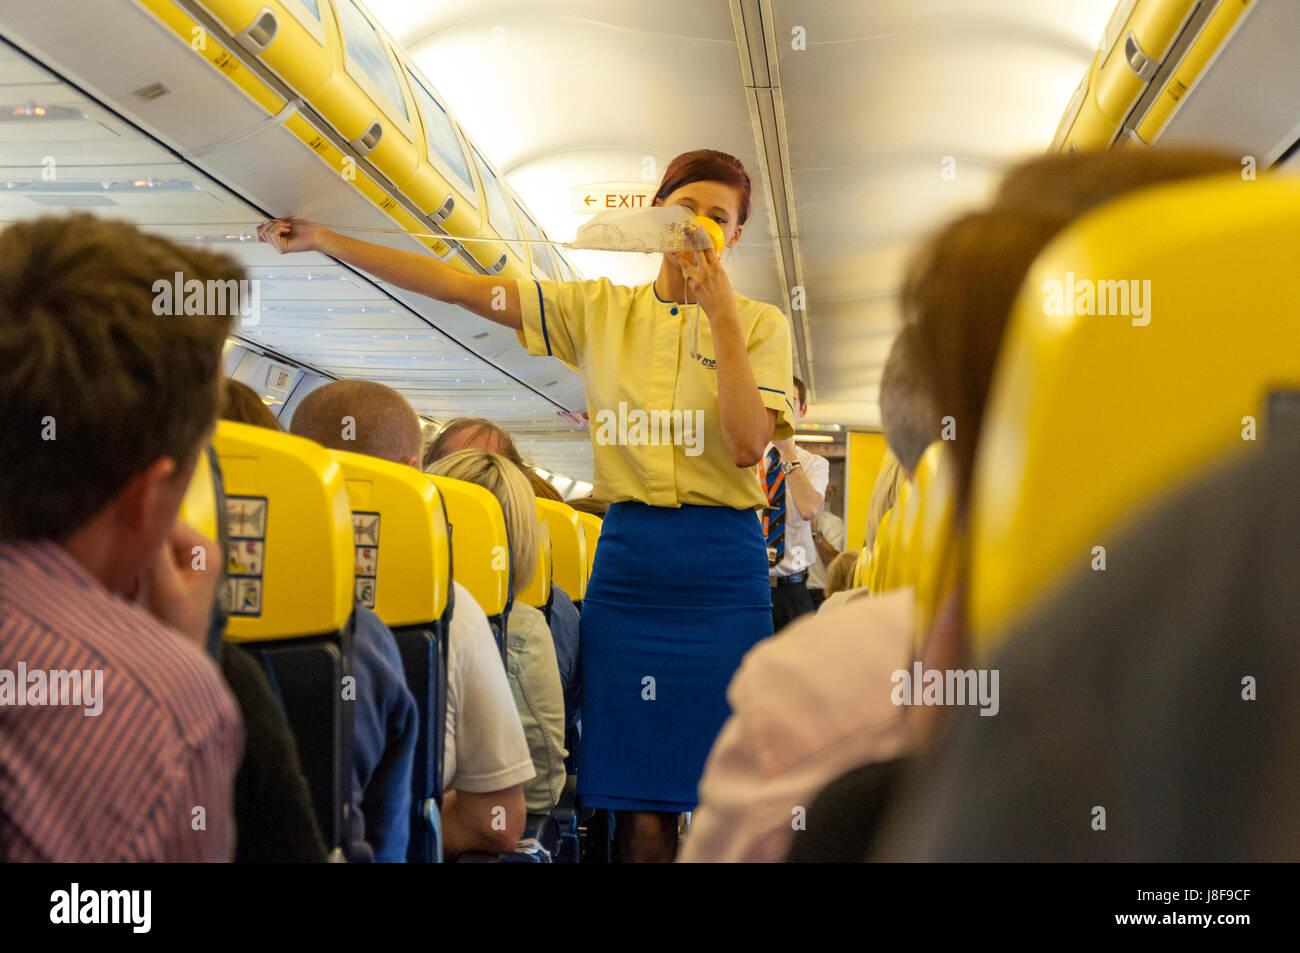 Flight safety demonstration aboard a Ryanair flight. Attendant demonstrates oxygen mask - Stock Image